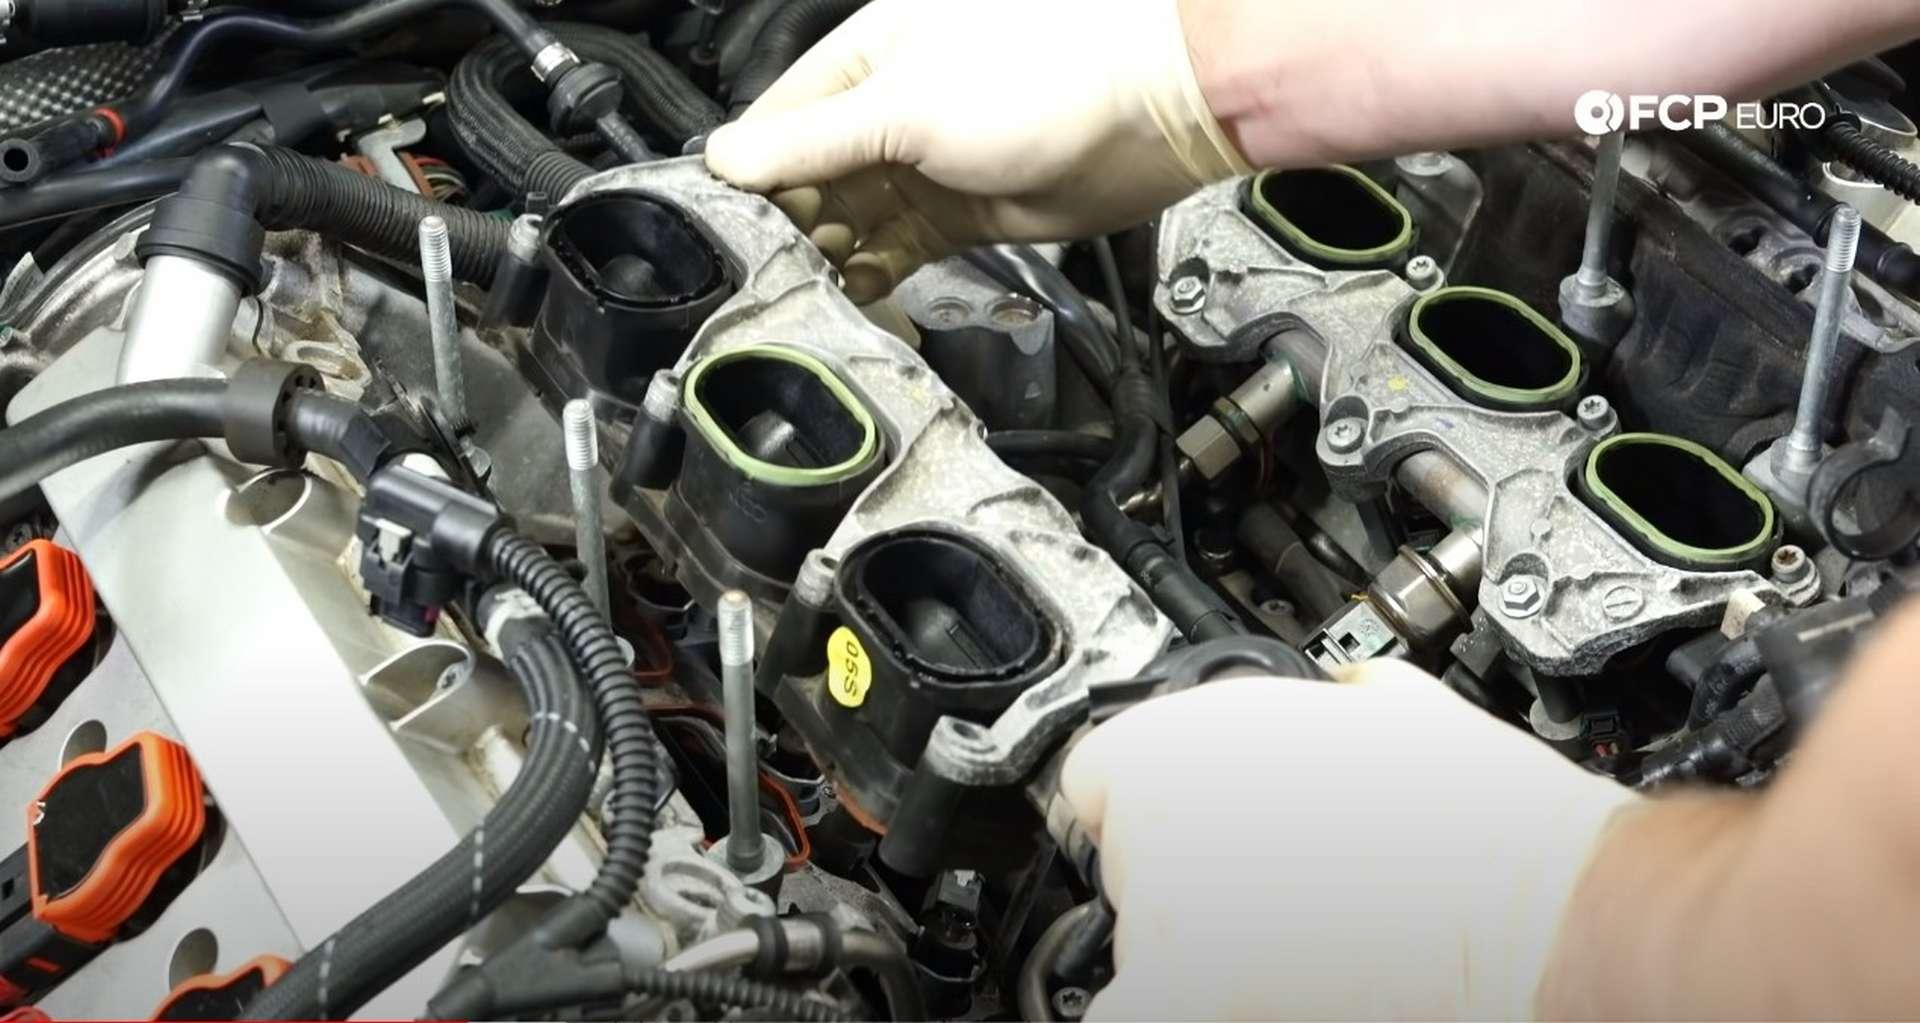 DIY Audi 3.0t Walnut Blasting Intake Valves removing the manifold